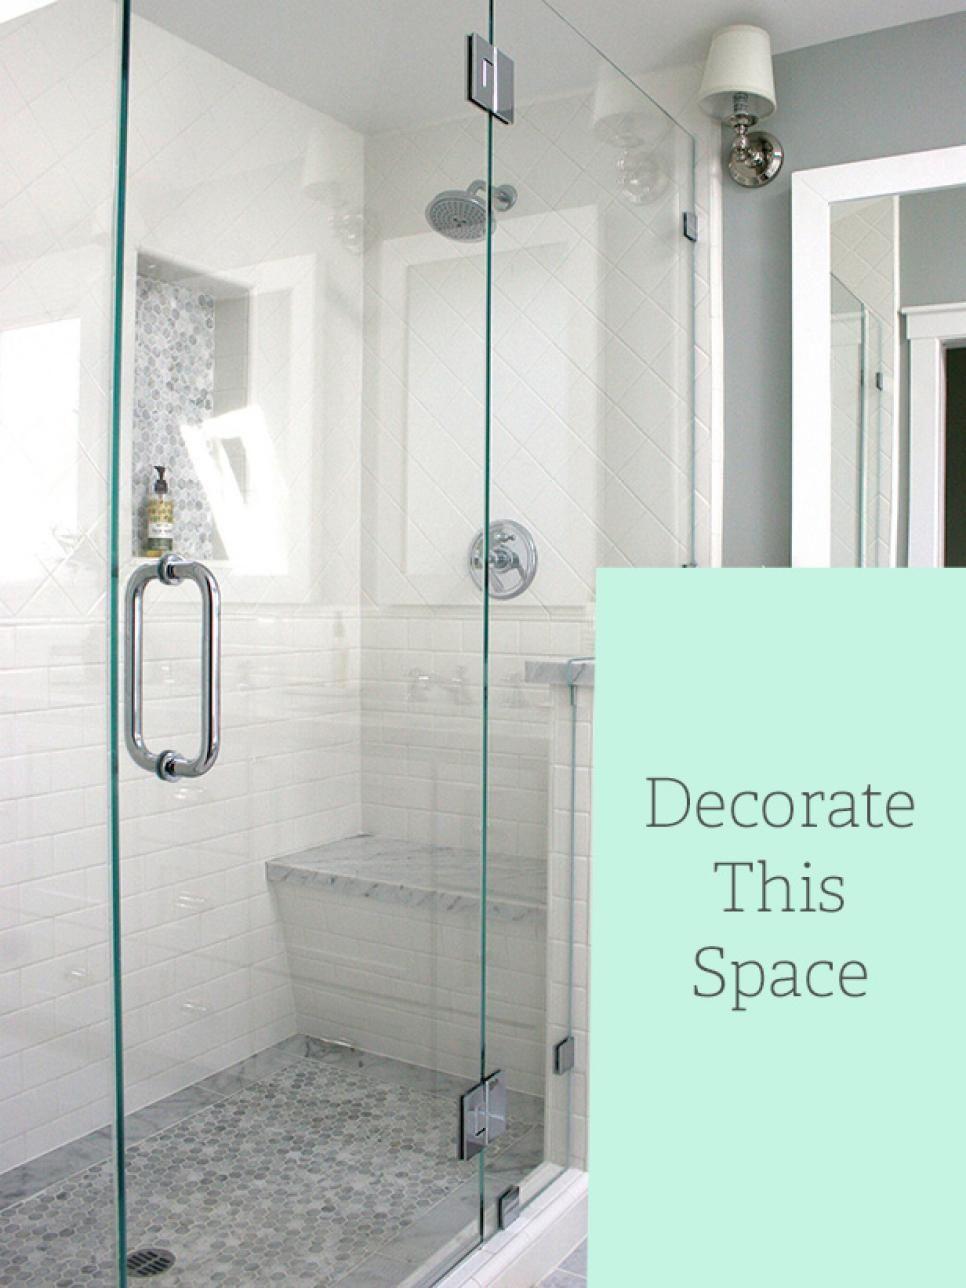 Bathroom Design Quiz take the hgtv design quiz | to the, spaces and design elements